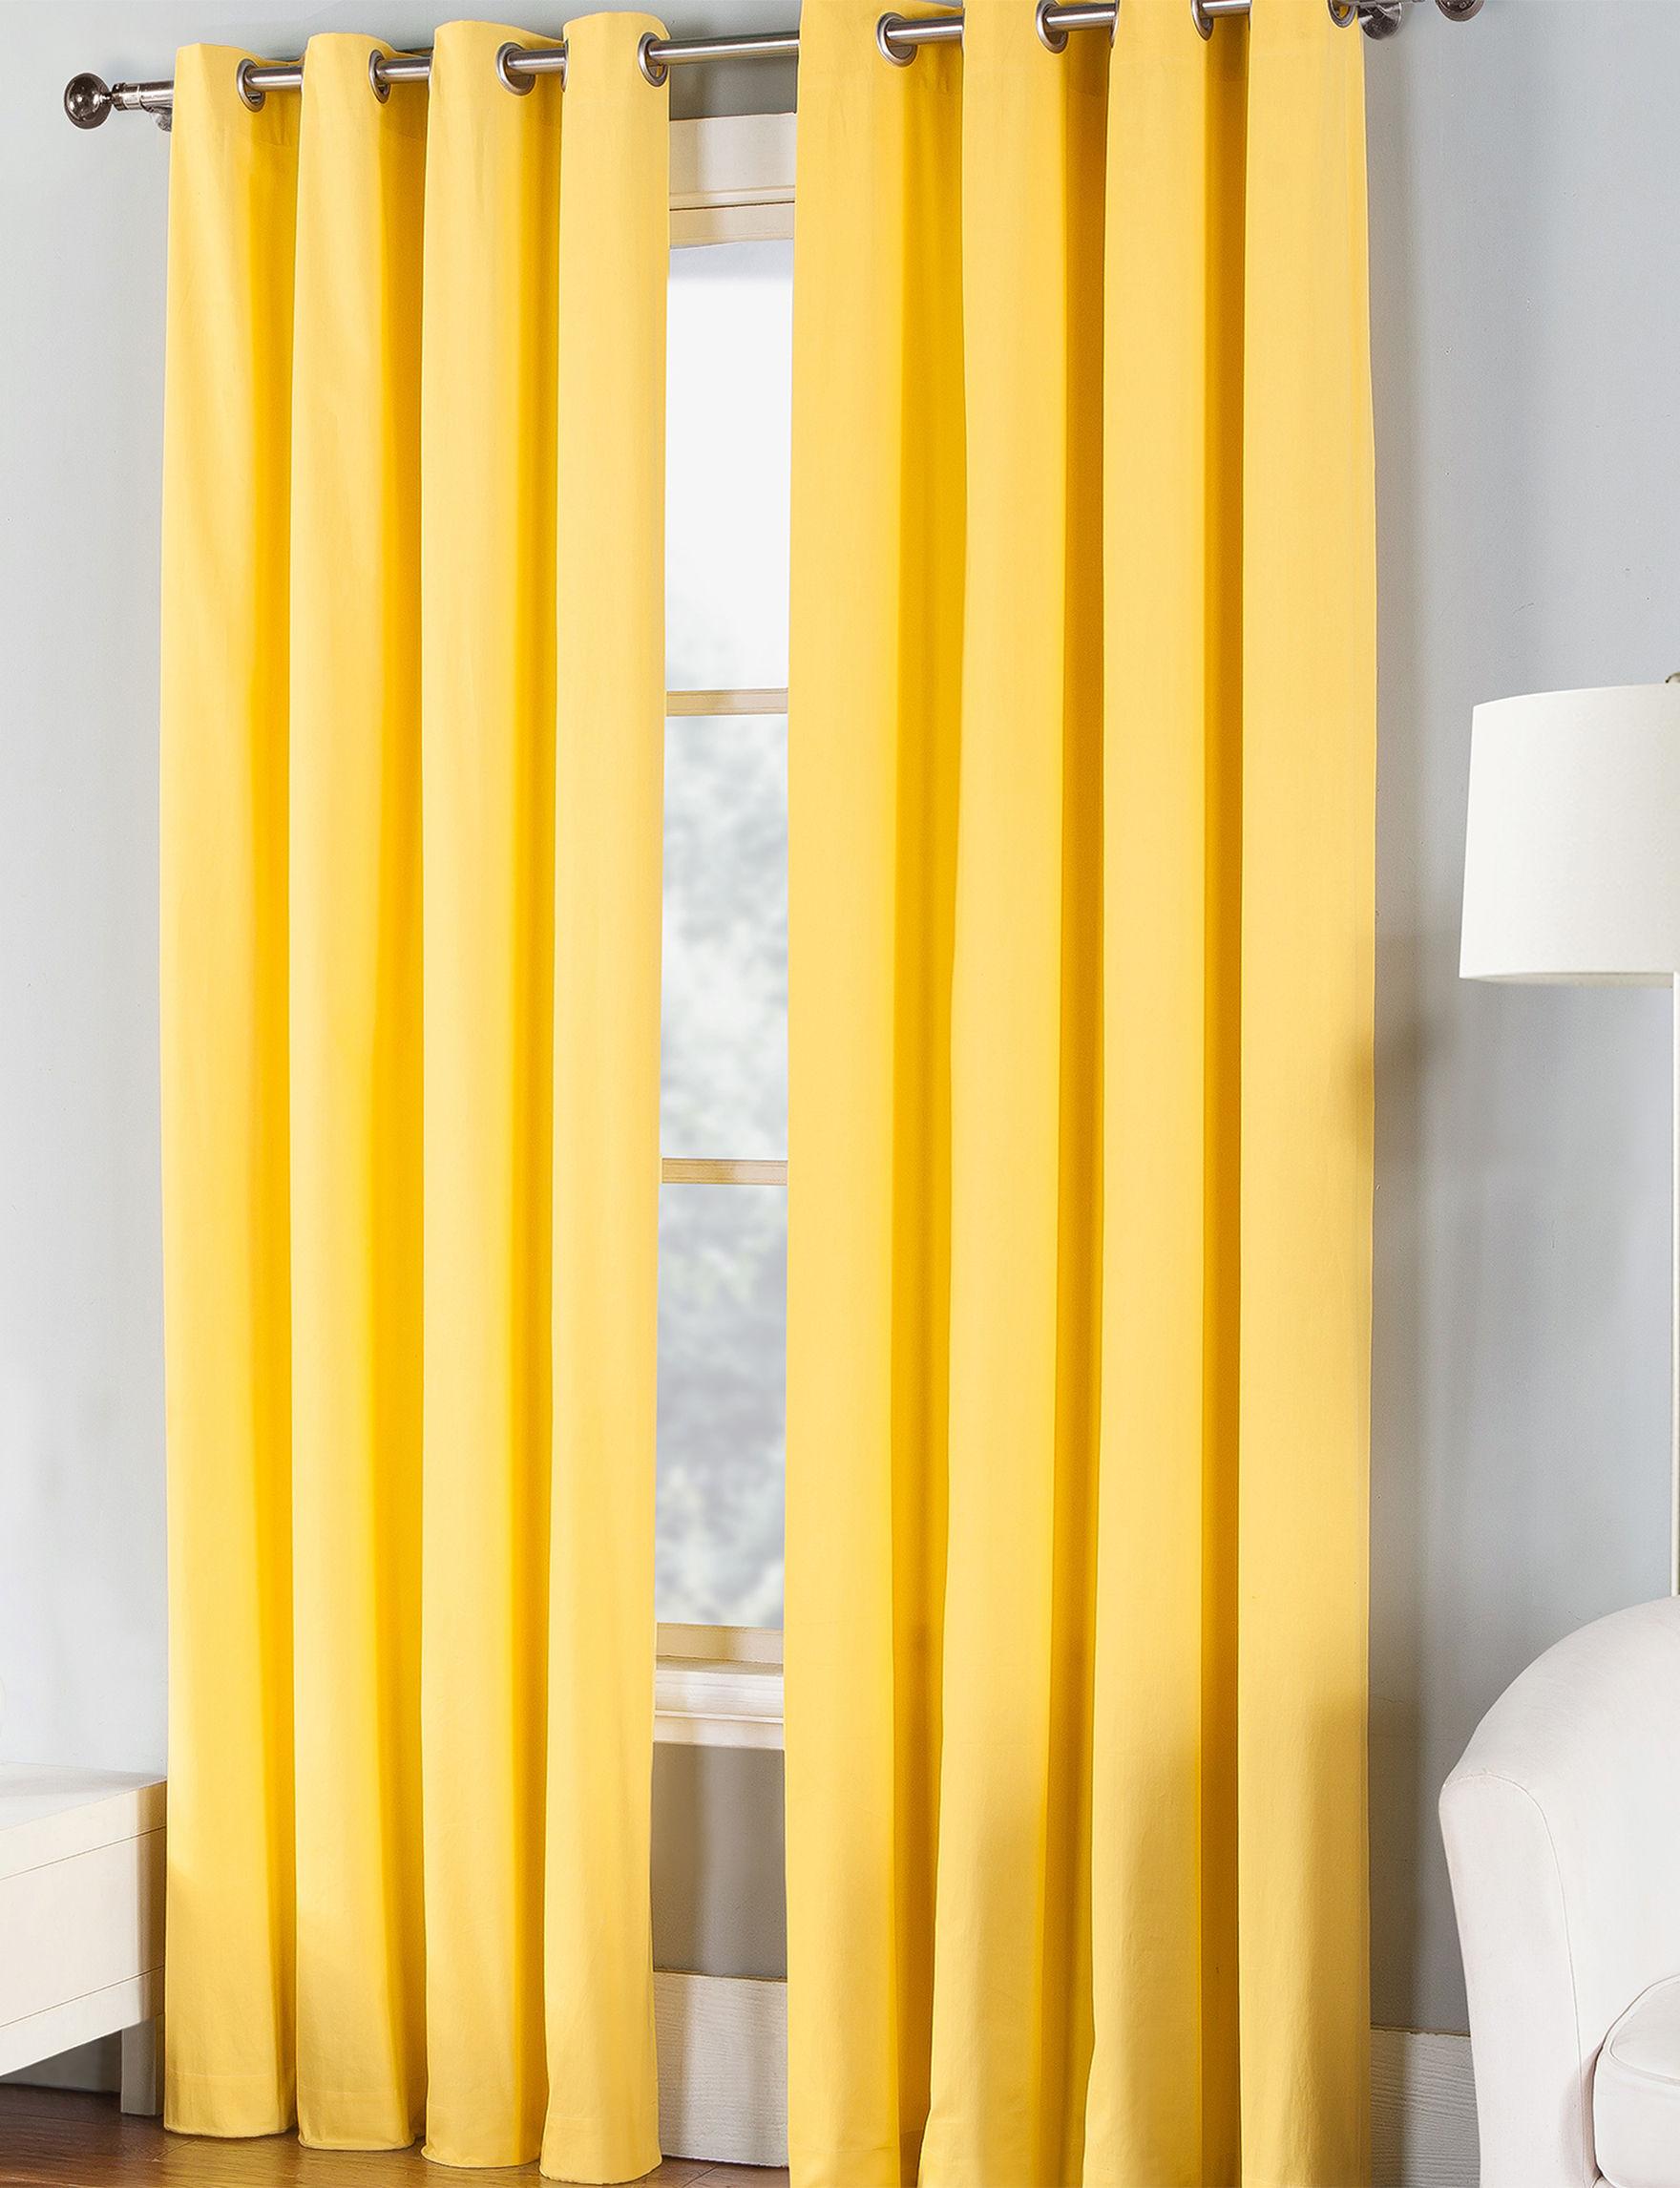 Fiesta Yellow Curtains & Drapes Window Treatments